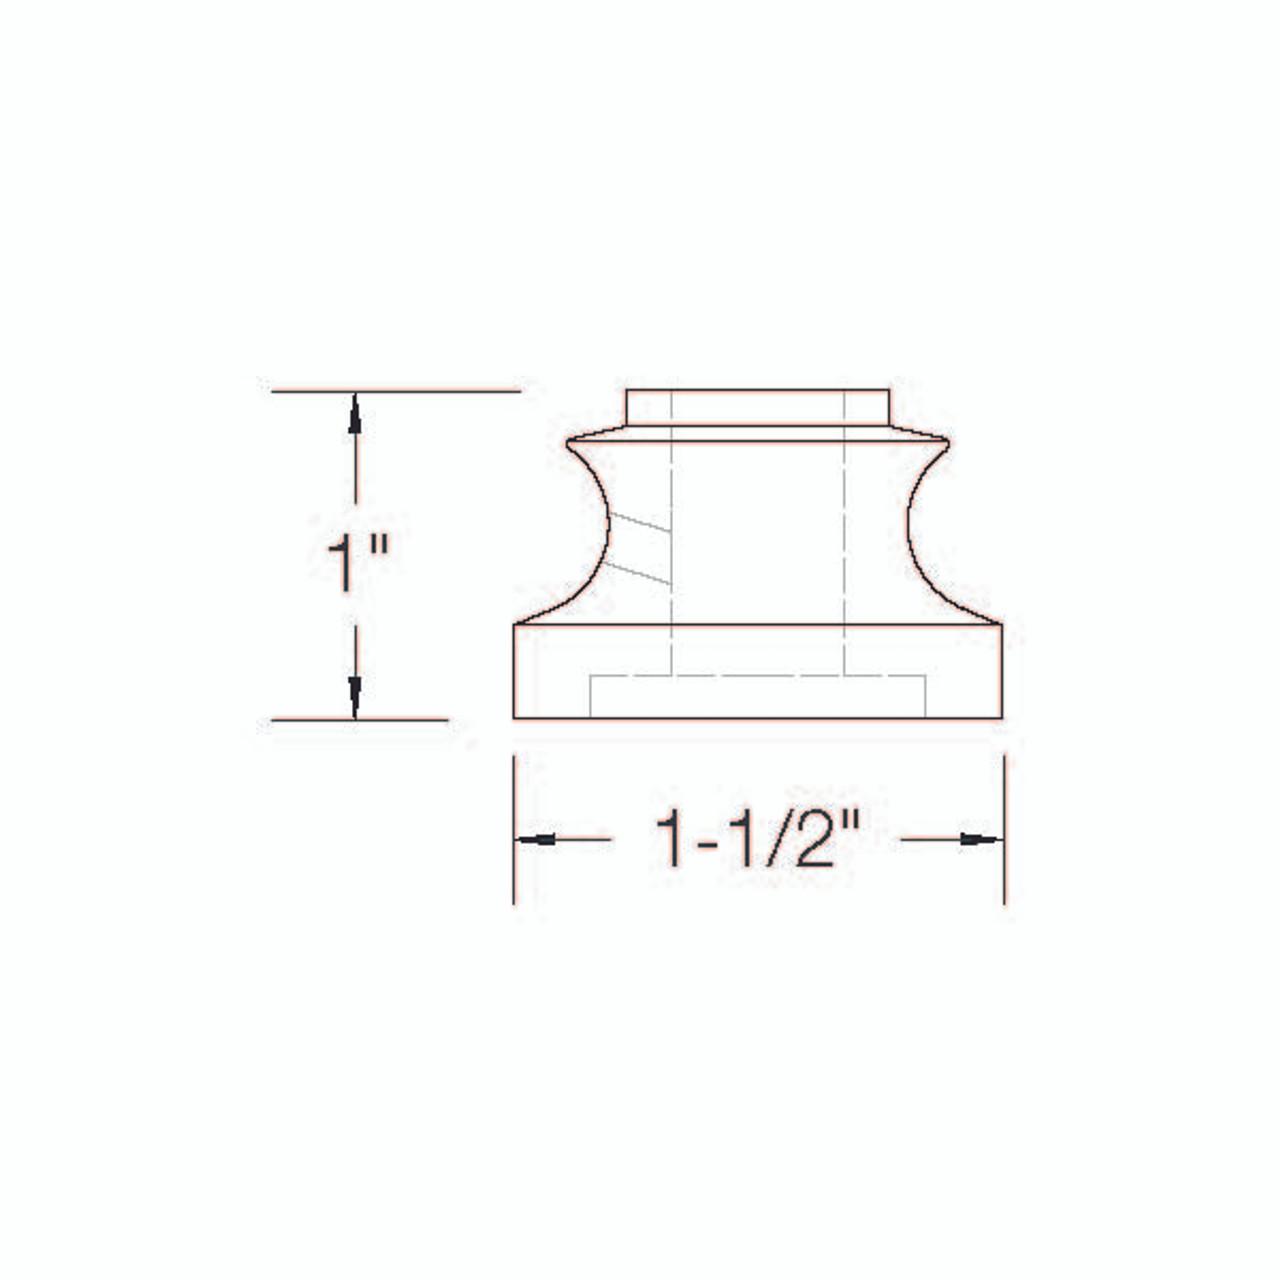 SHR900 12mm Flat Light Shoe with Set Screw